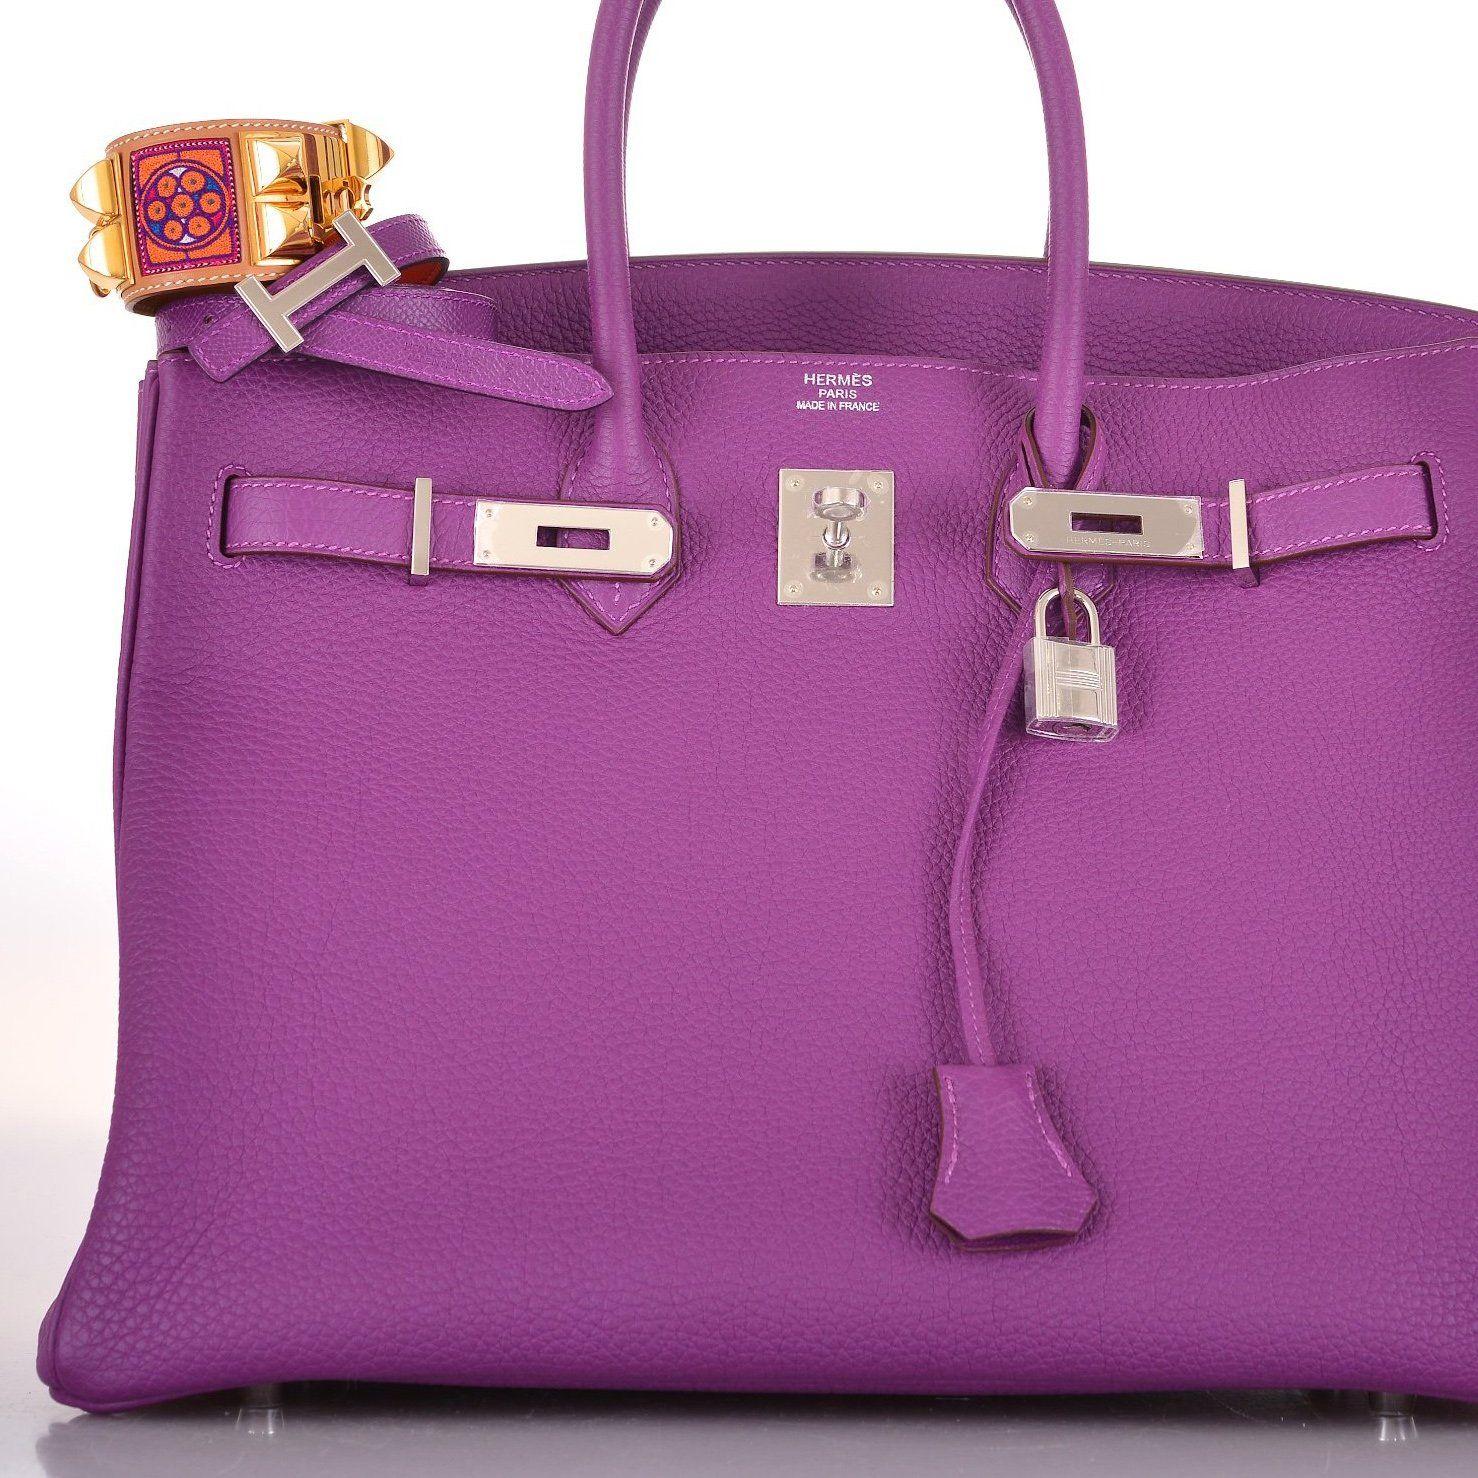 1ae0e4c3d40 Fancy - Hermes Birkin Bag 35cm Anemone with Pall Hardware